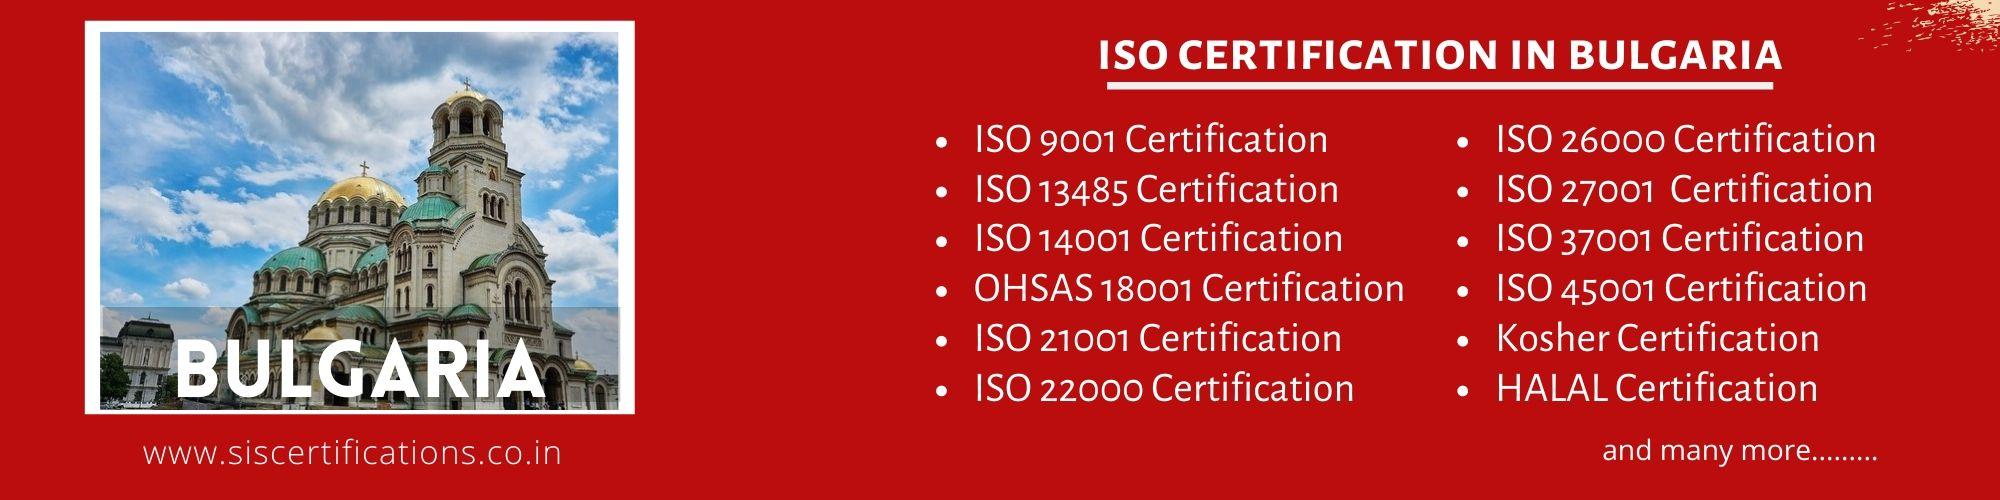 ISO Certification in Bulgaria;ISO 9001 Certification in Bulgaria;